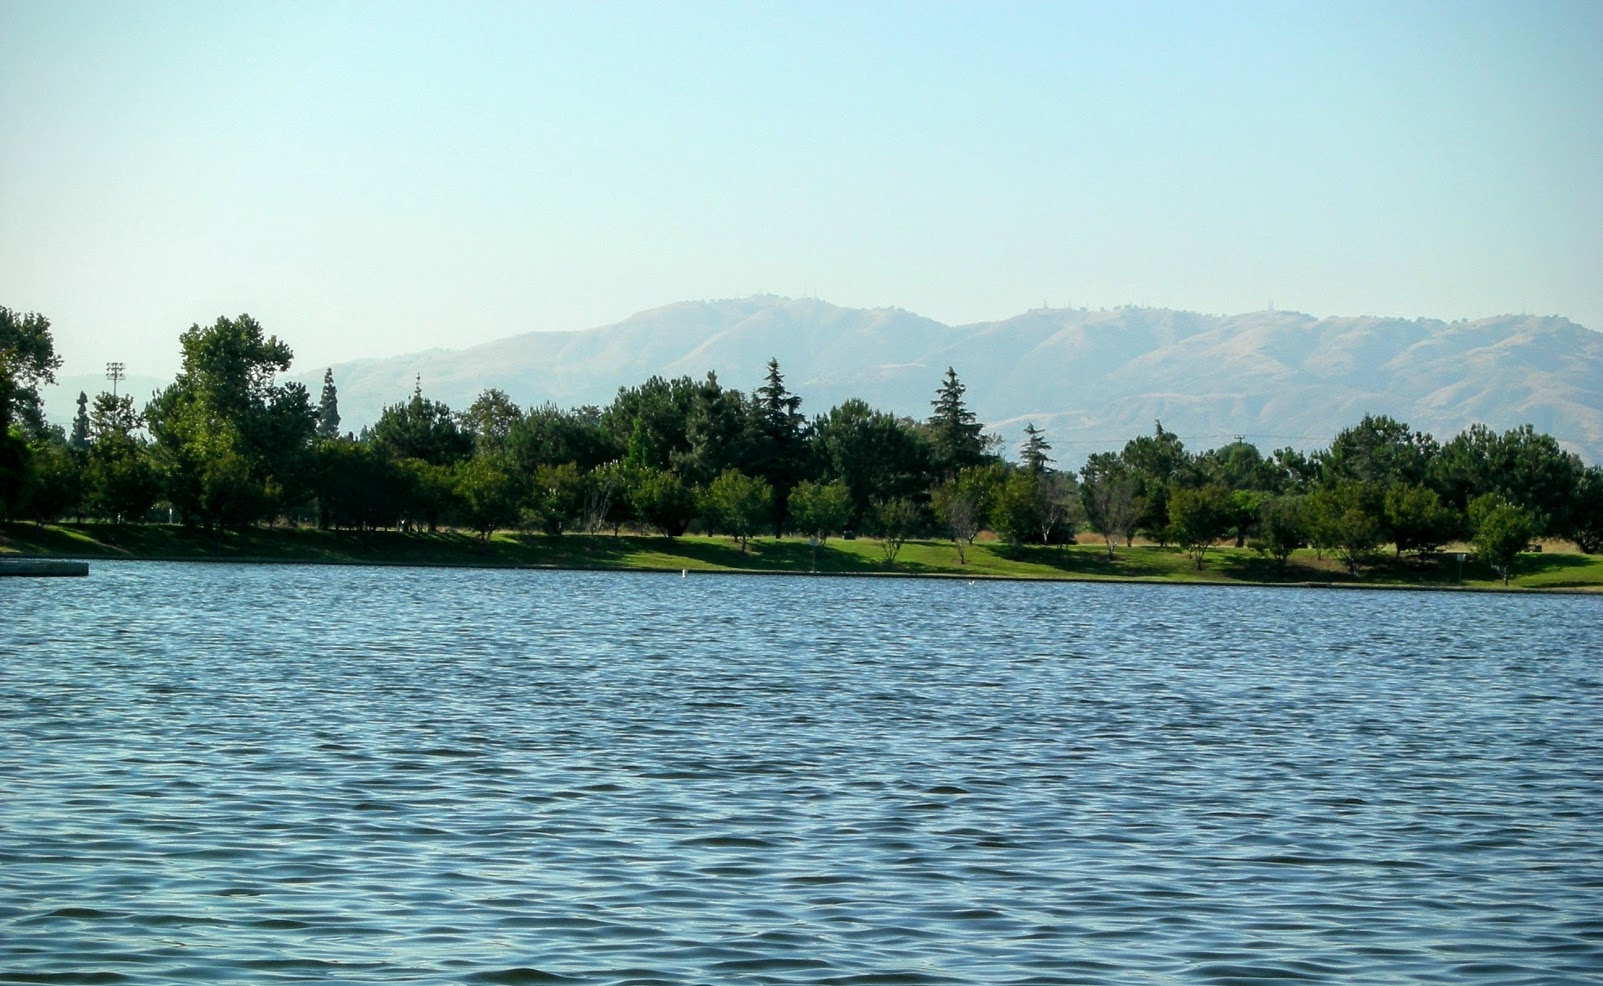 lake-balboa-park-10